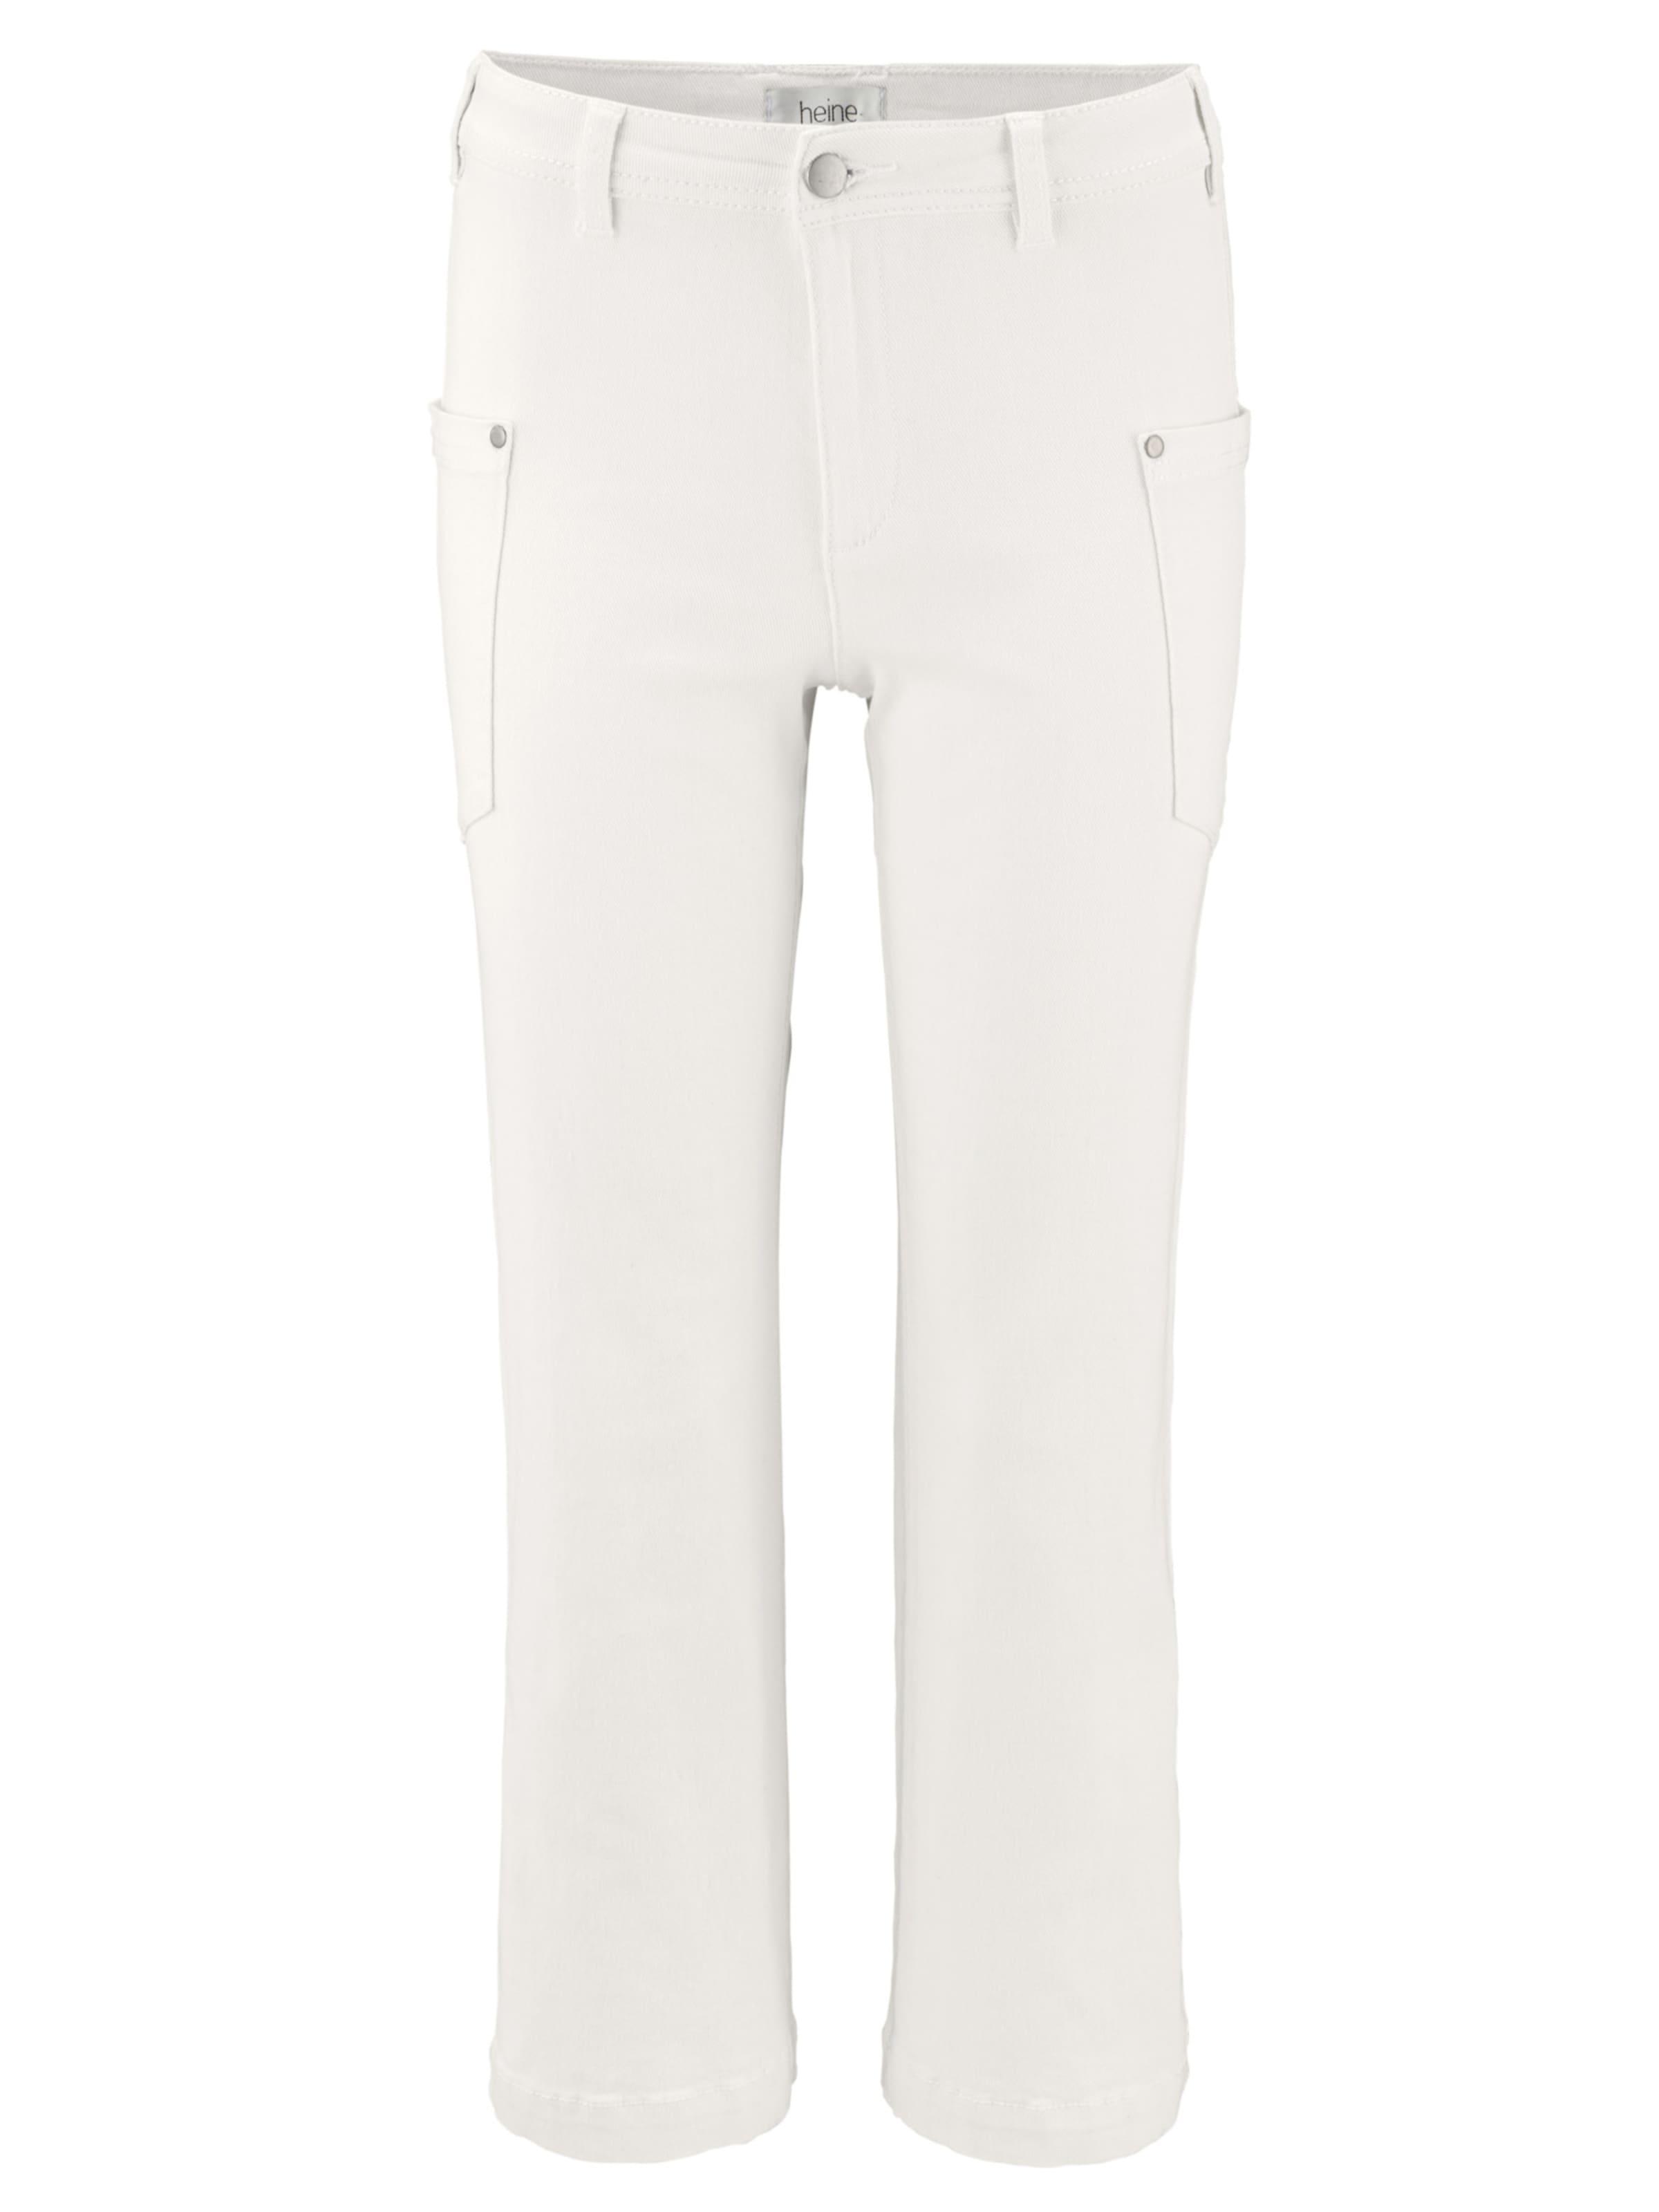 En Cassé Heine Heine Blanc Heine Cassé Pantalon En Blanc Pantalon Pantalon En y8wvNmn0O